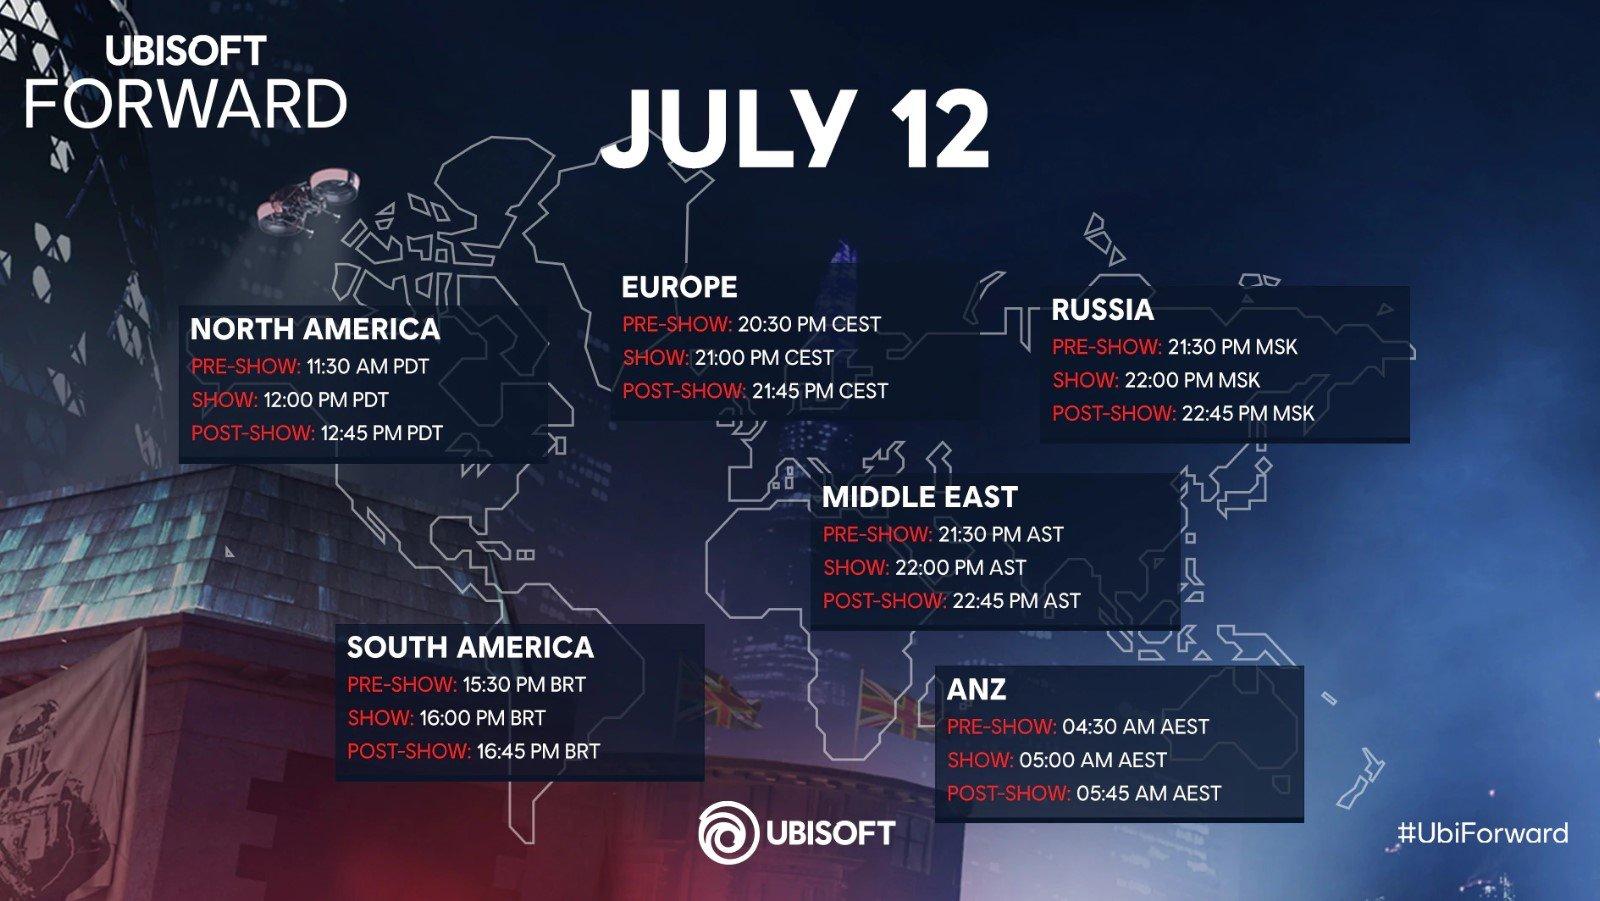 موعد حدث Ubisoft Forward